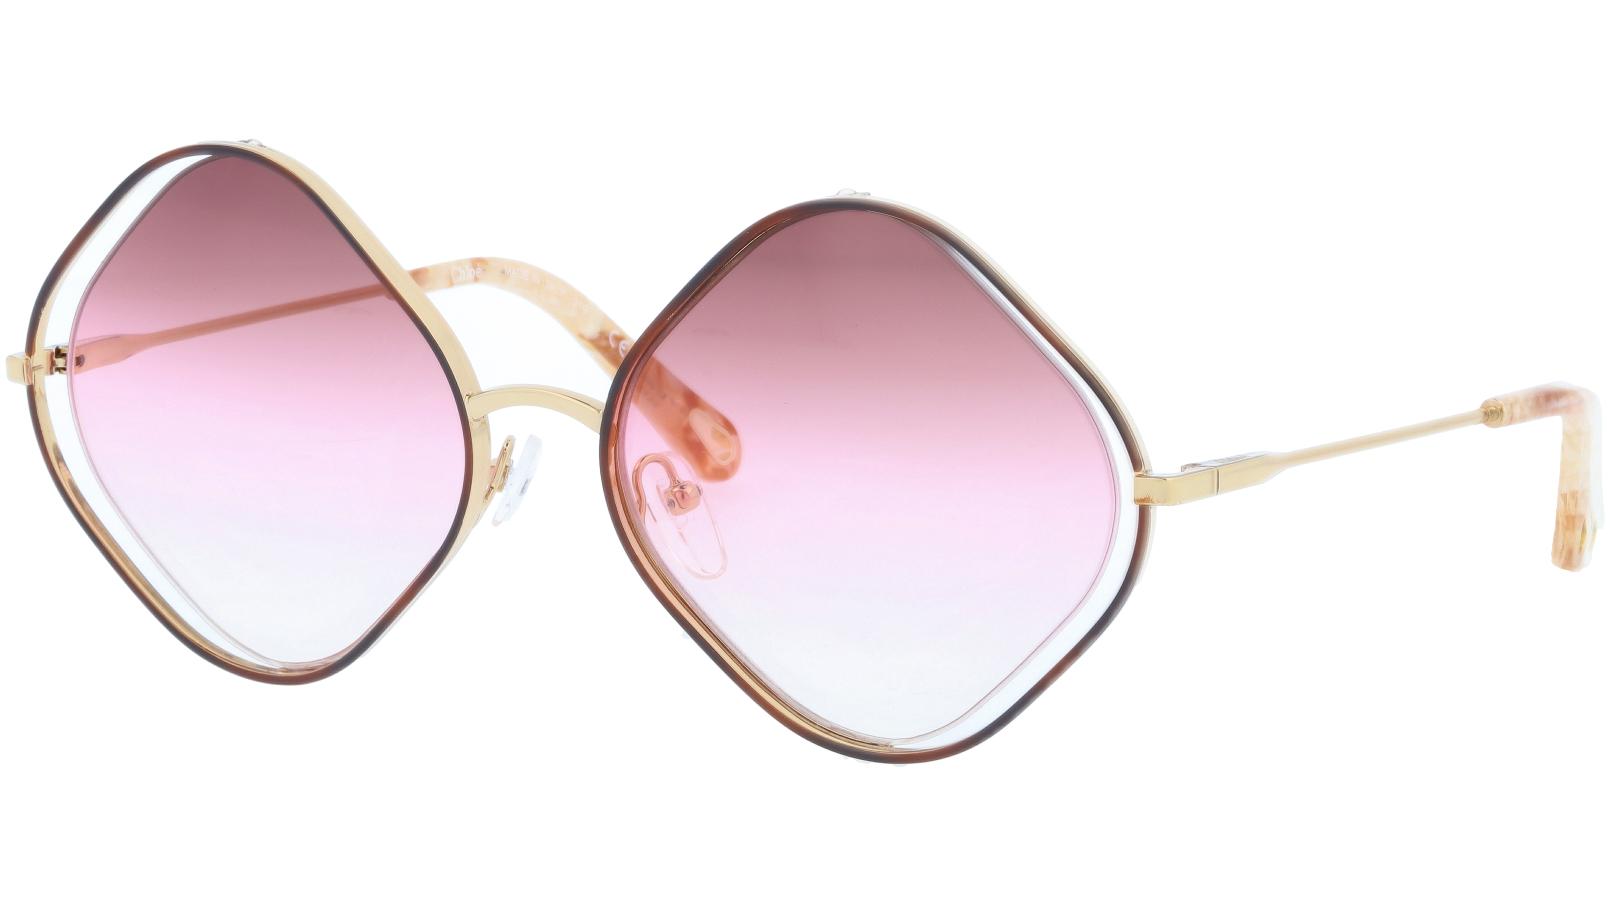 Chloé CE159S 865 57 Havana Geometric Sunglasses